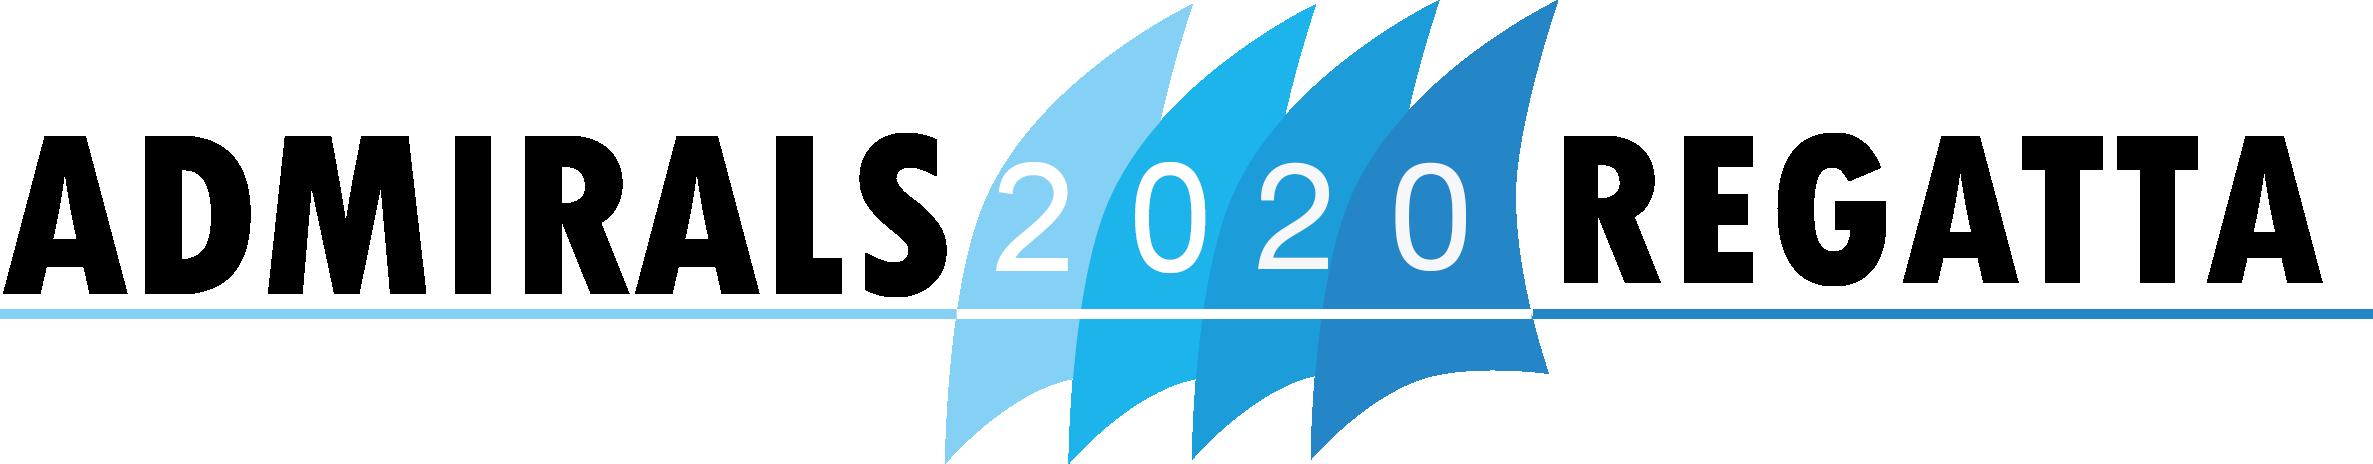 Admirals Regatta Bold Black 2020